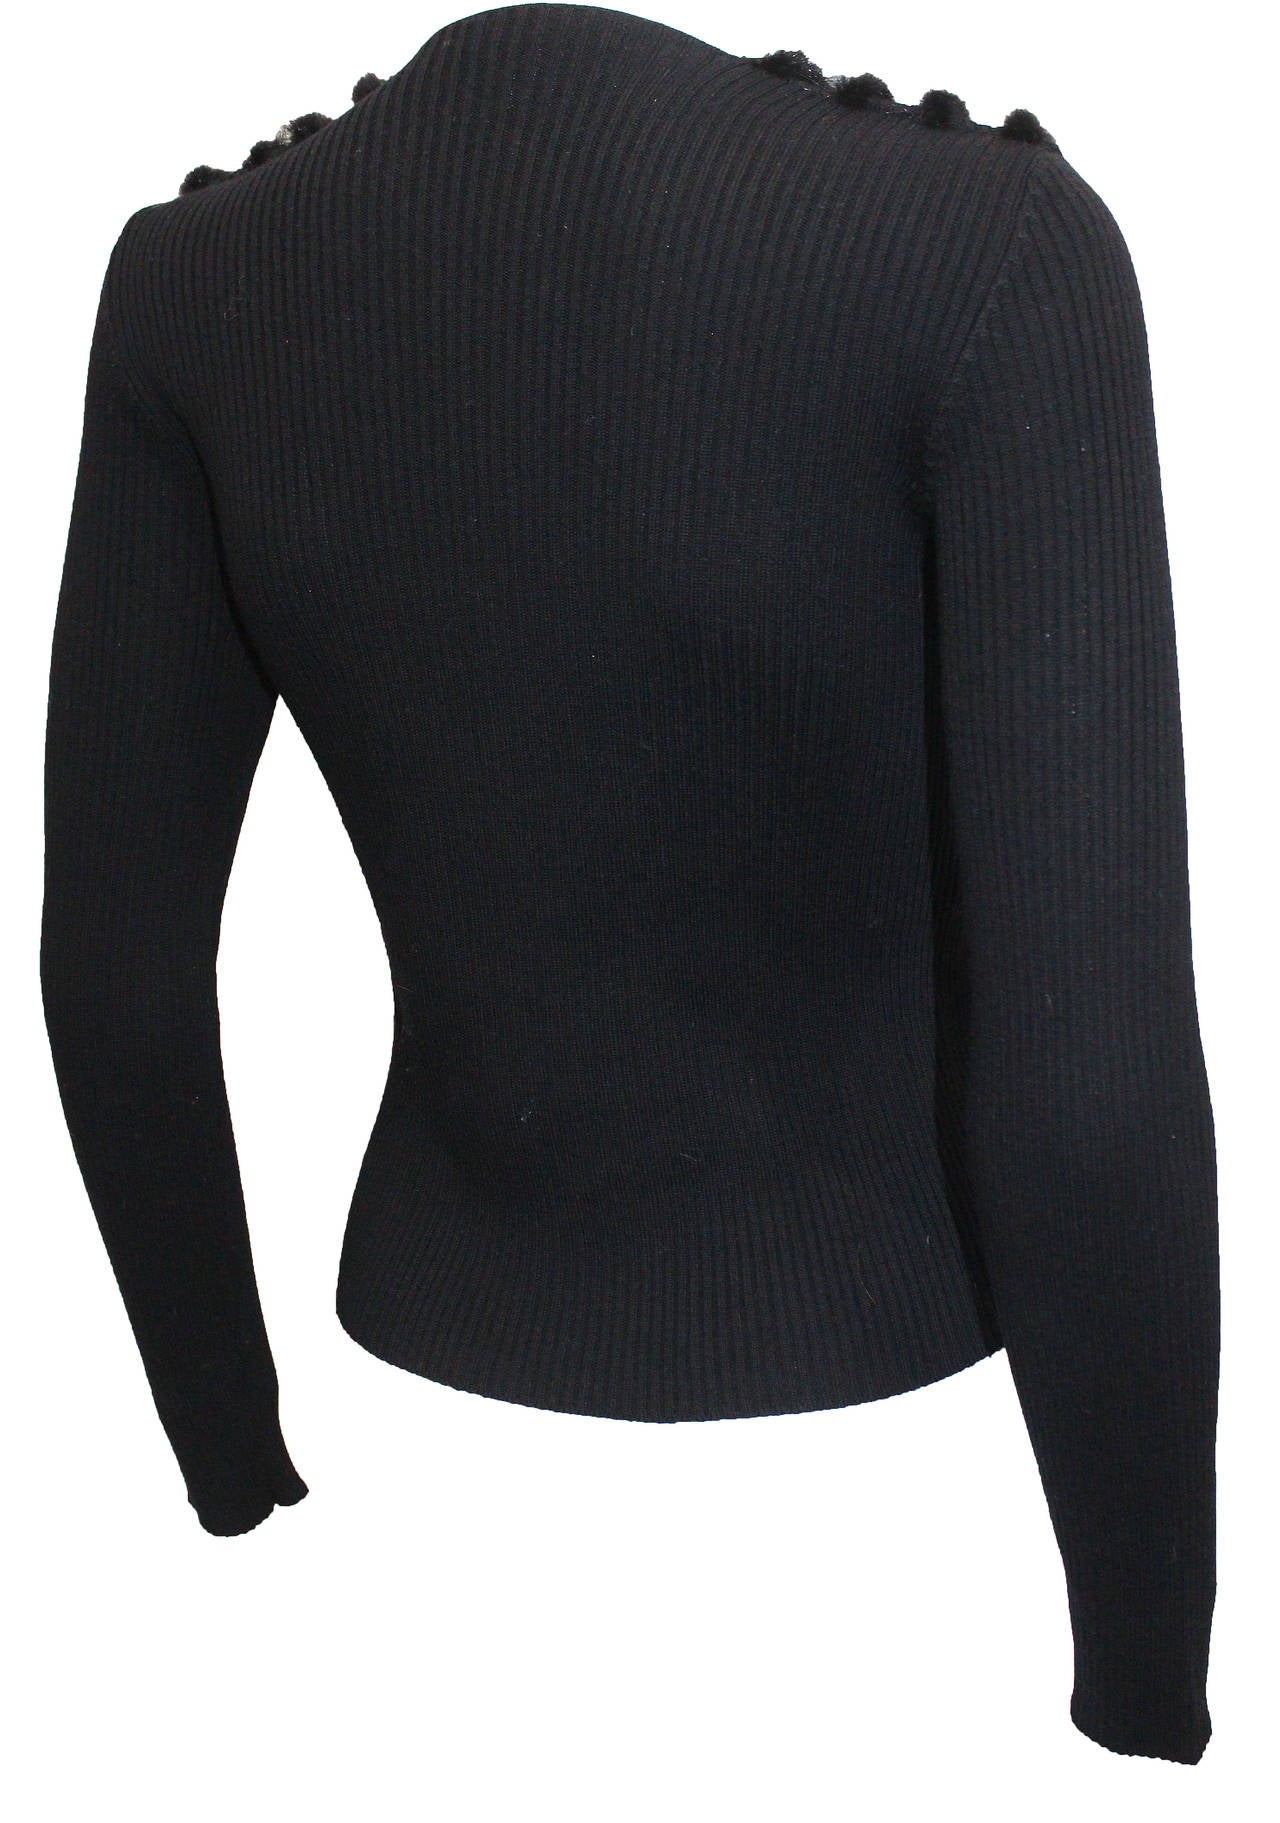 Black 1990s Prada Mink Fur Striped Sweater For Sale